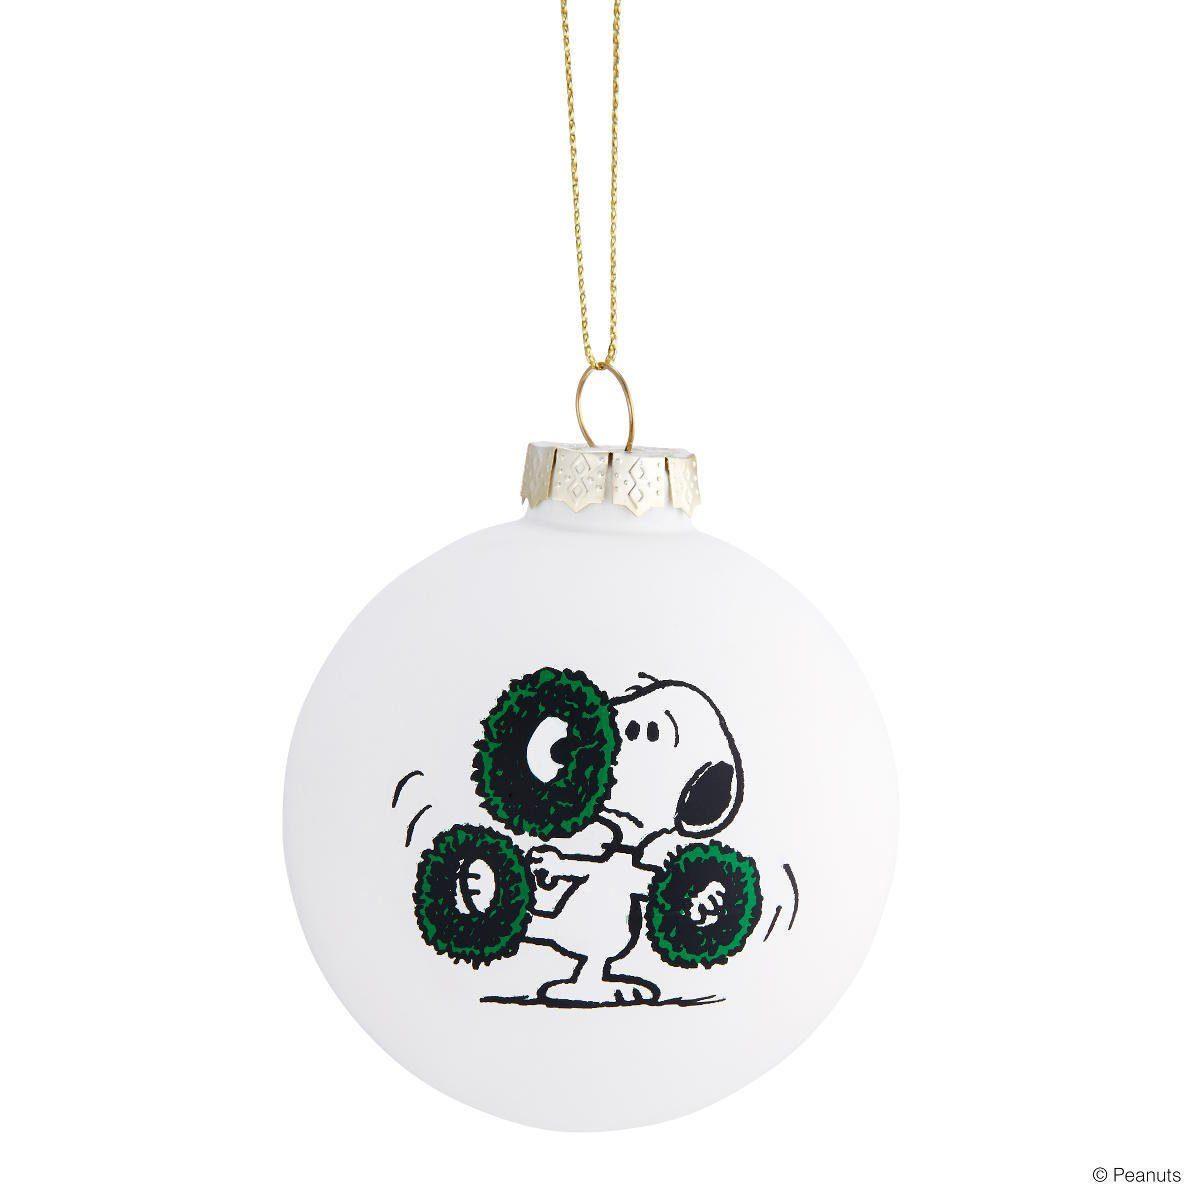 BUTLERS PEANUTS »Glaskugel Snoopy/Kränze«